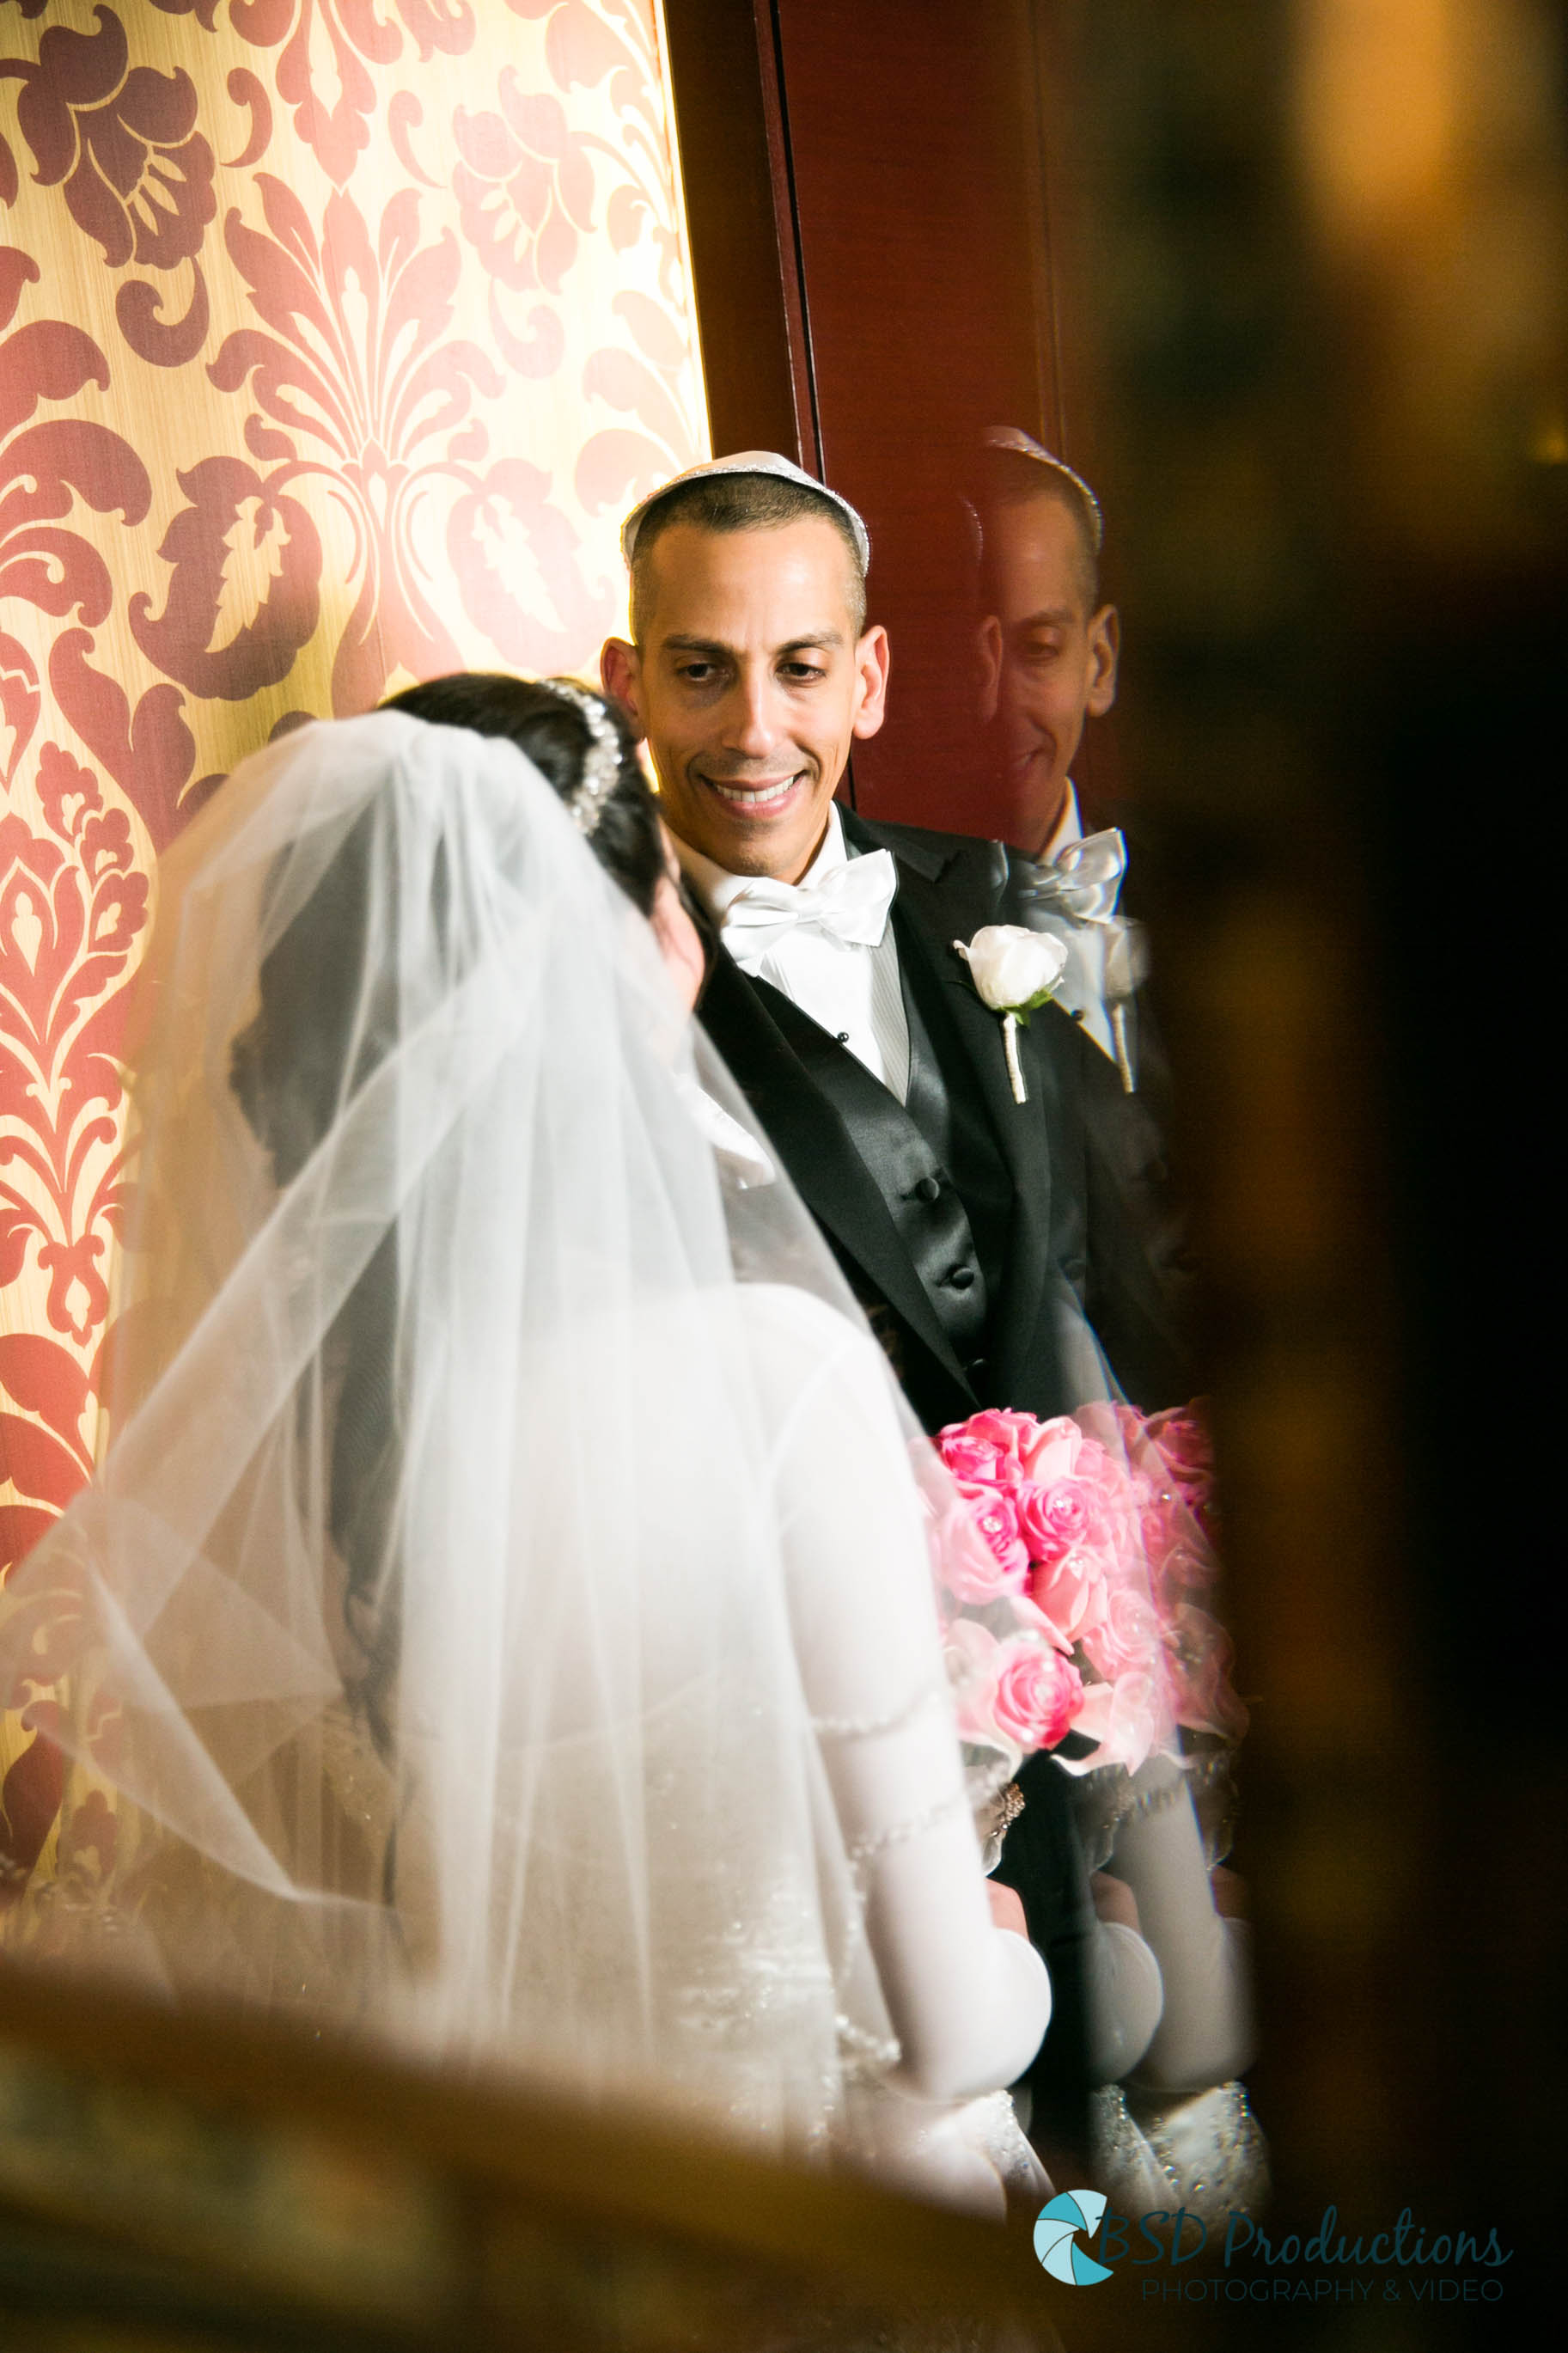 D_R_9846 Wedding – BSD Productions Photography